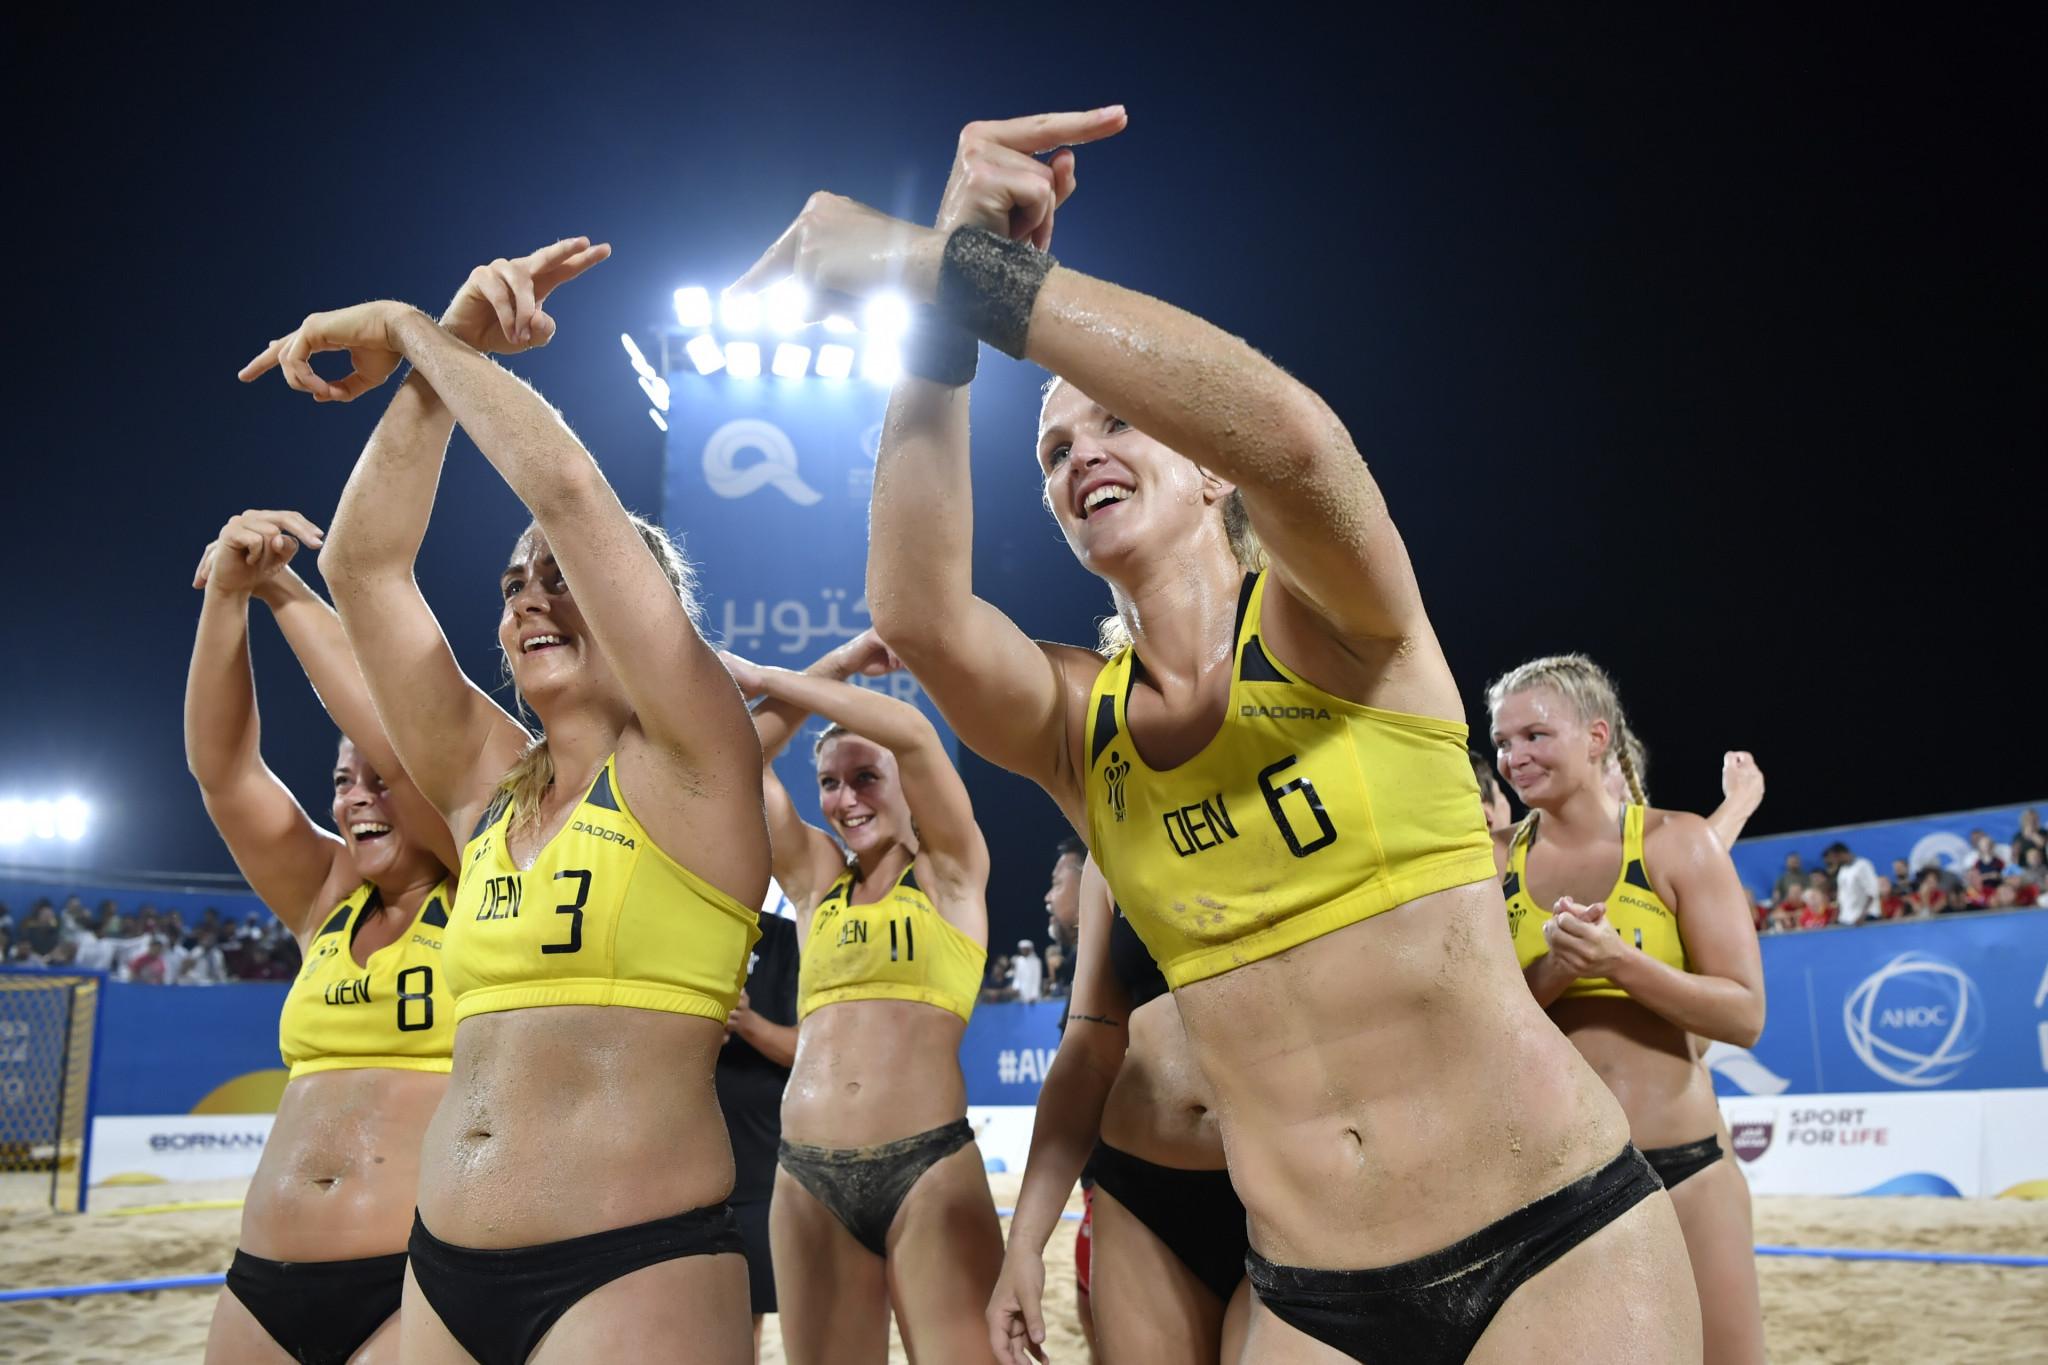 Denmark won the women's beach handball title ©ANOC